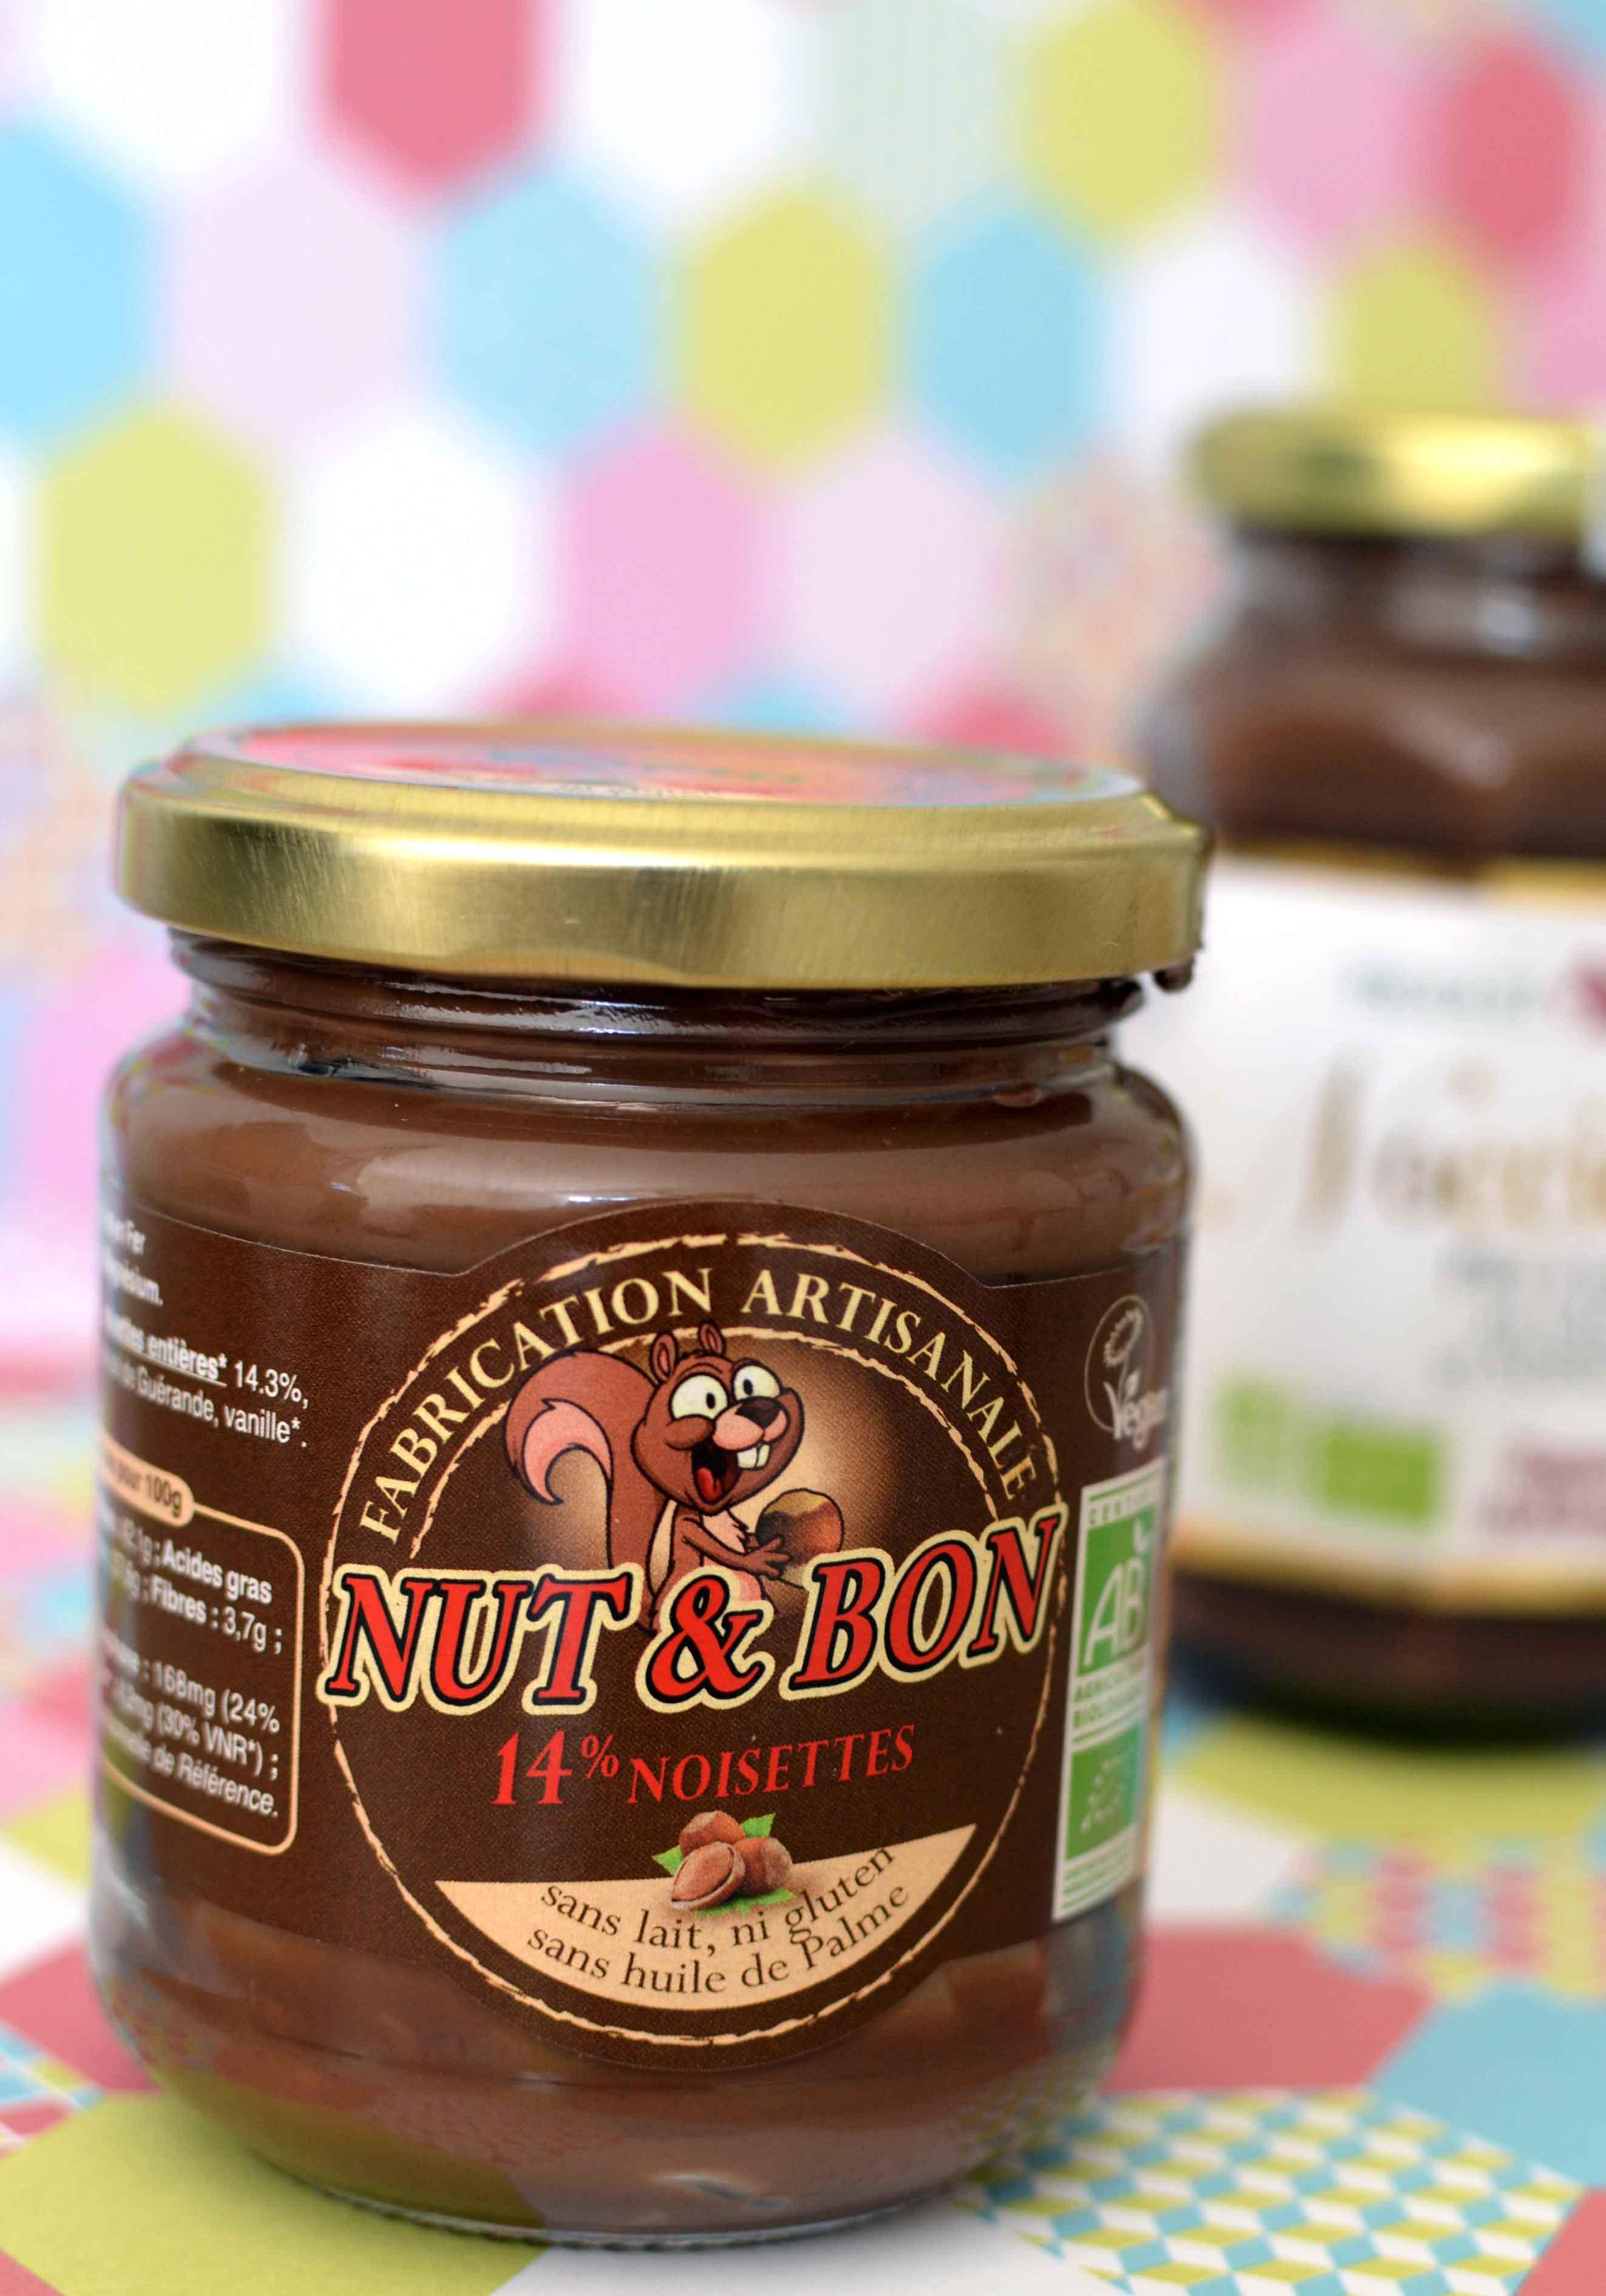 Nut&bon vegan